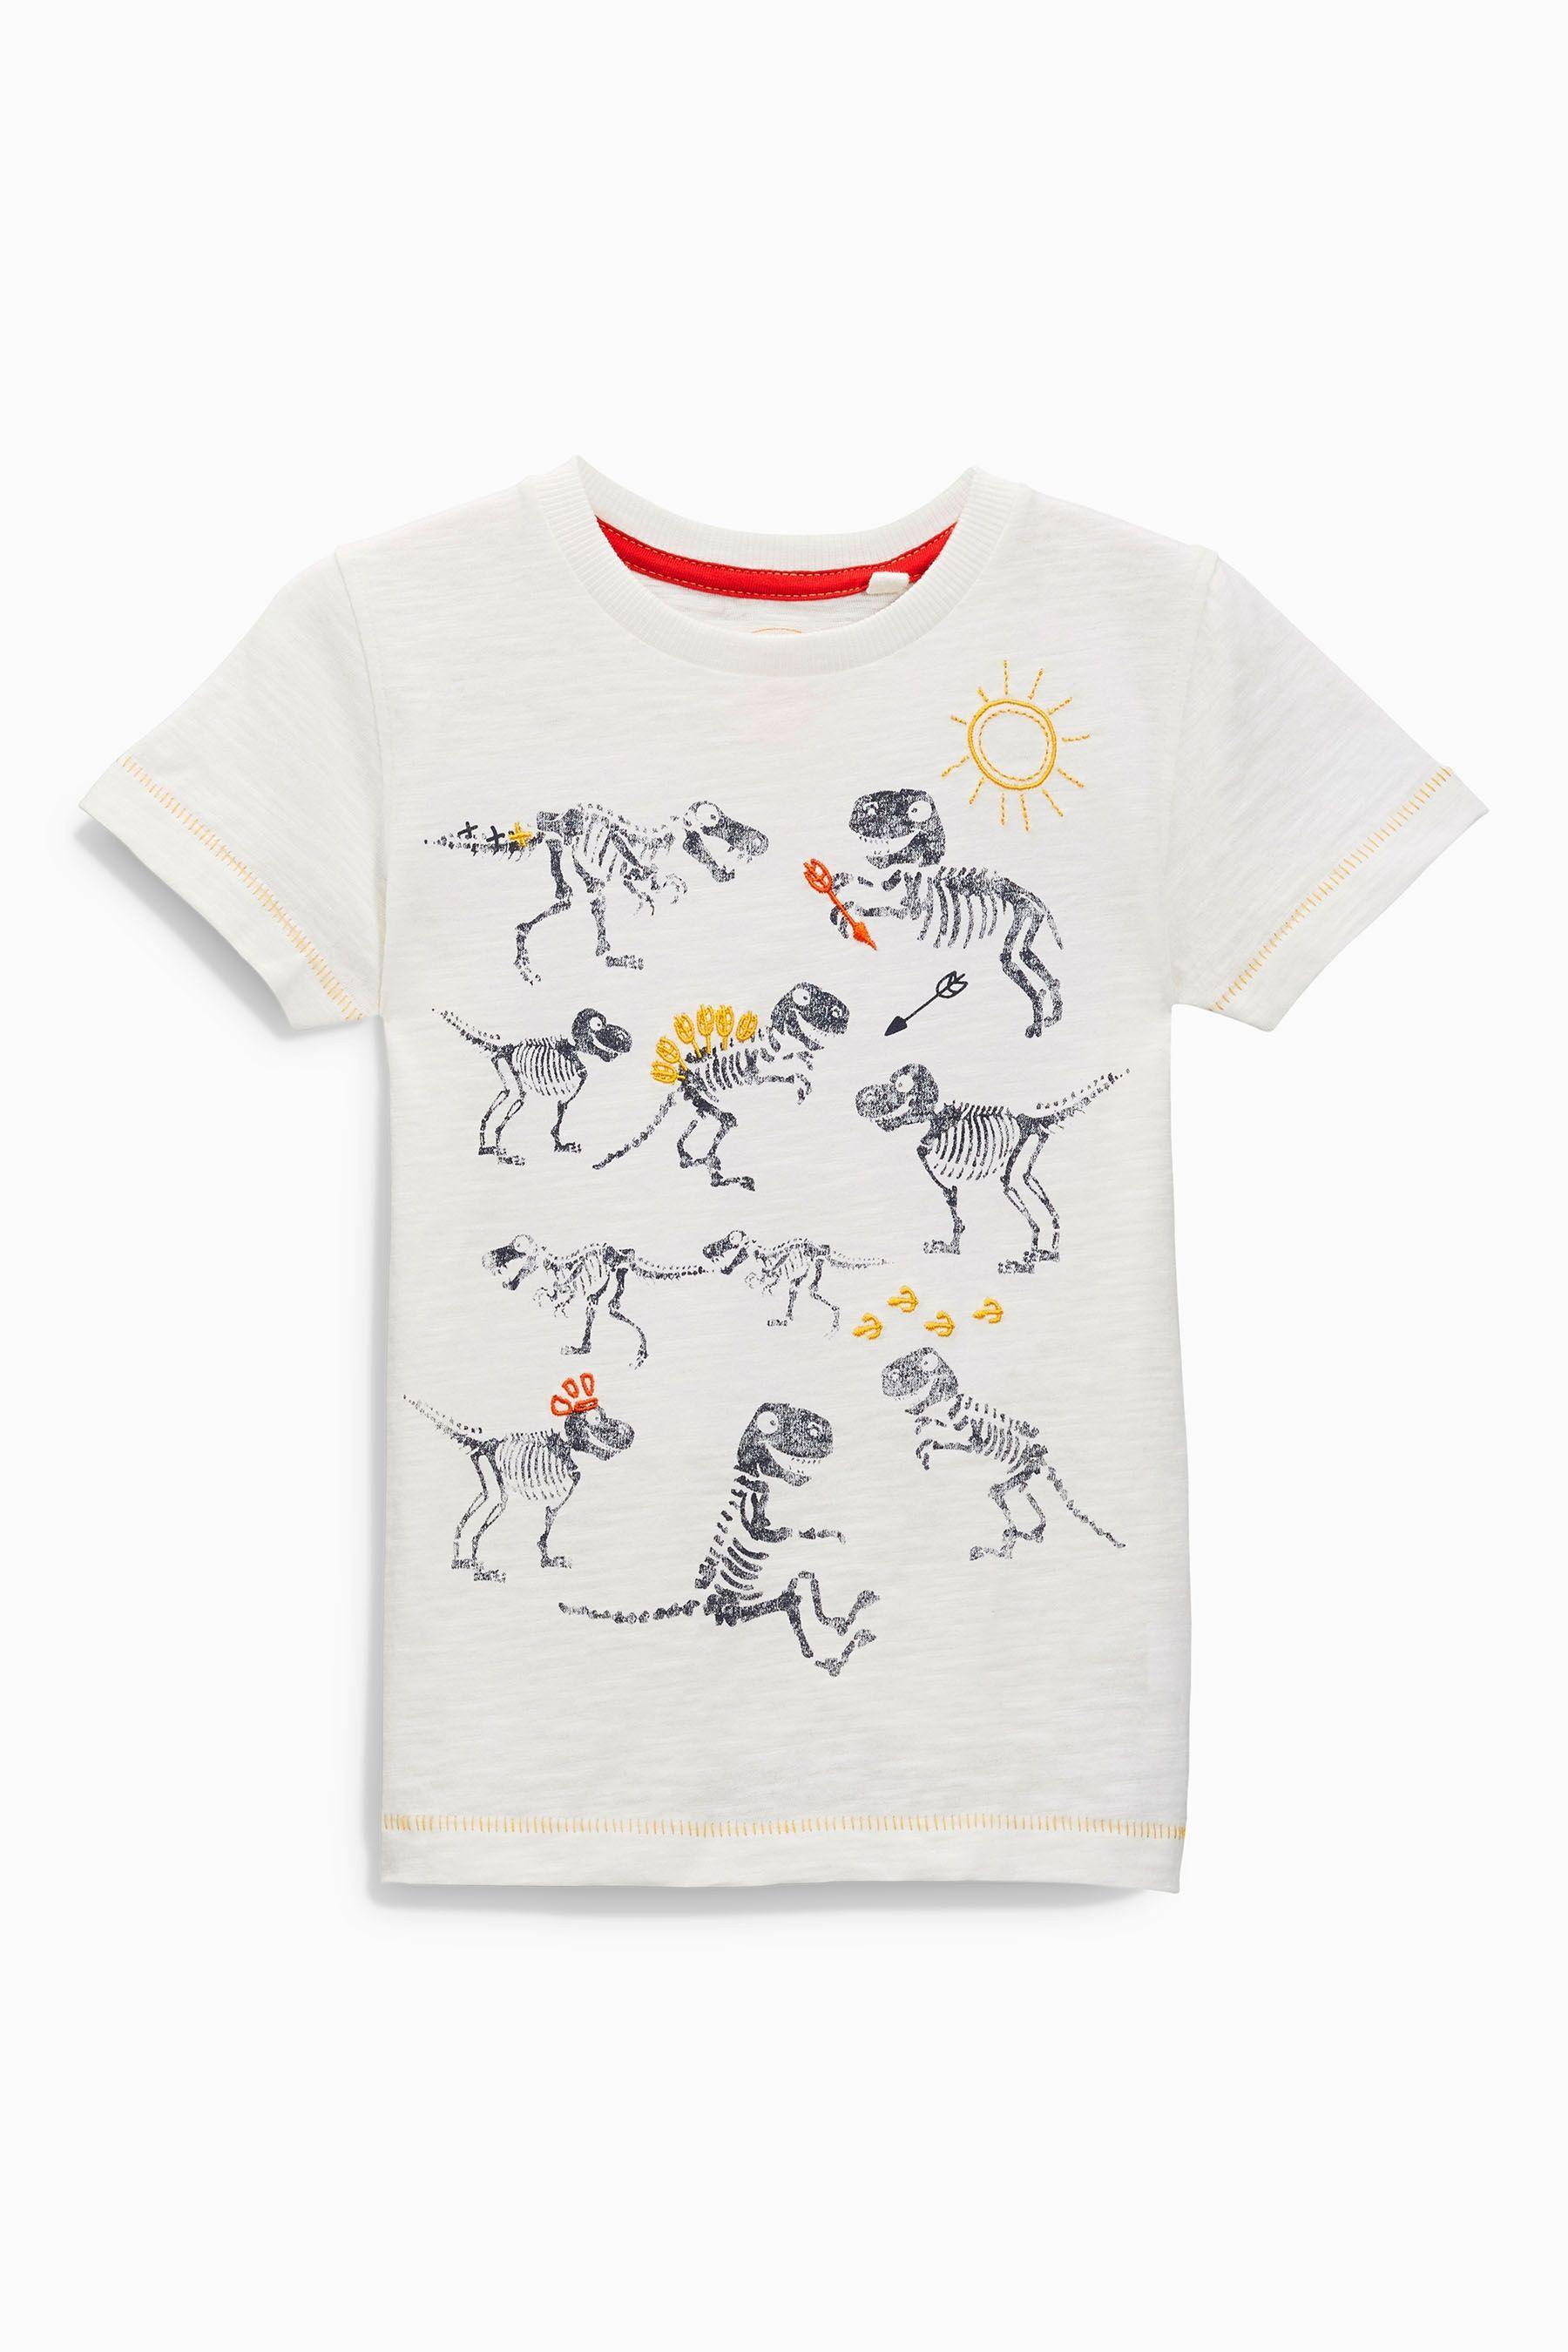 4d4812991 Comprar Camiseta cruda con estampado de dinosaurio (3 meses-6 años) online  hoy en Next: España